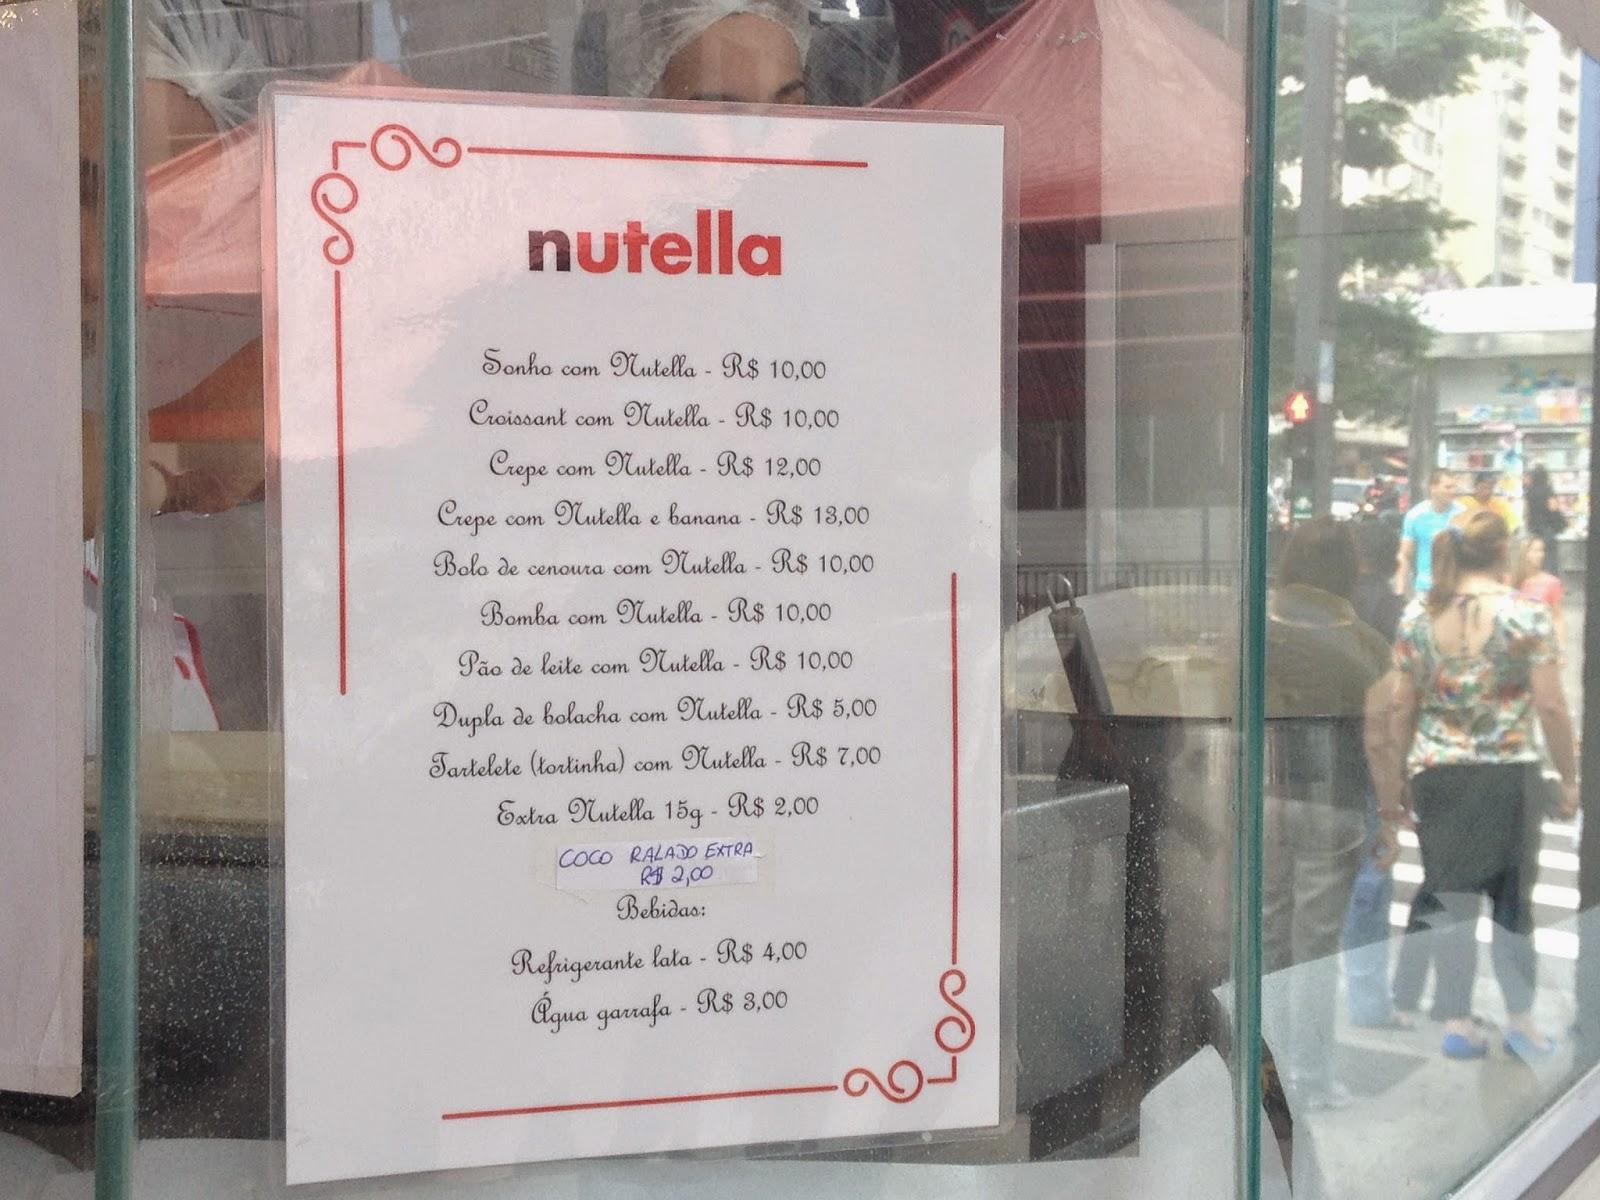 Nutella, Quiosque, paulista, degusta, comida, food, atração, petiscos, barato